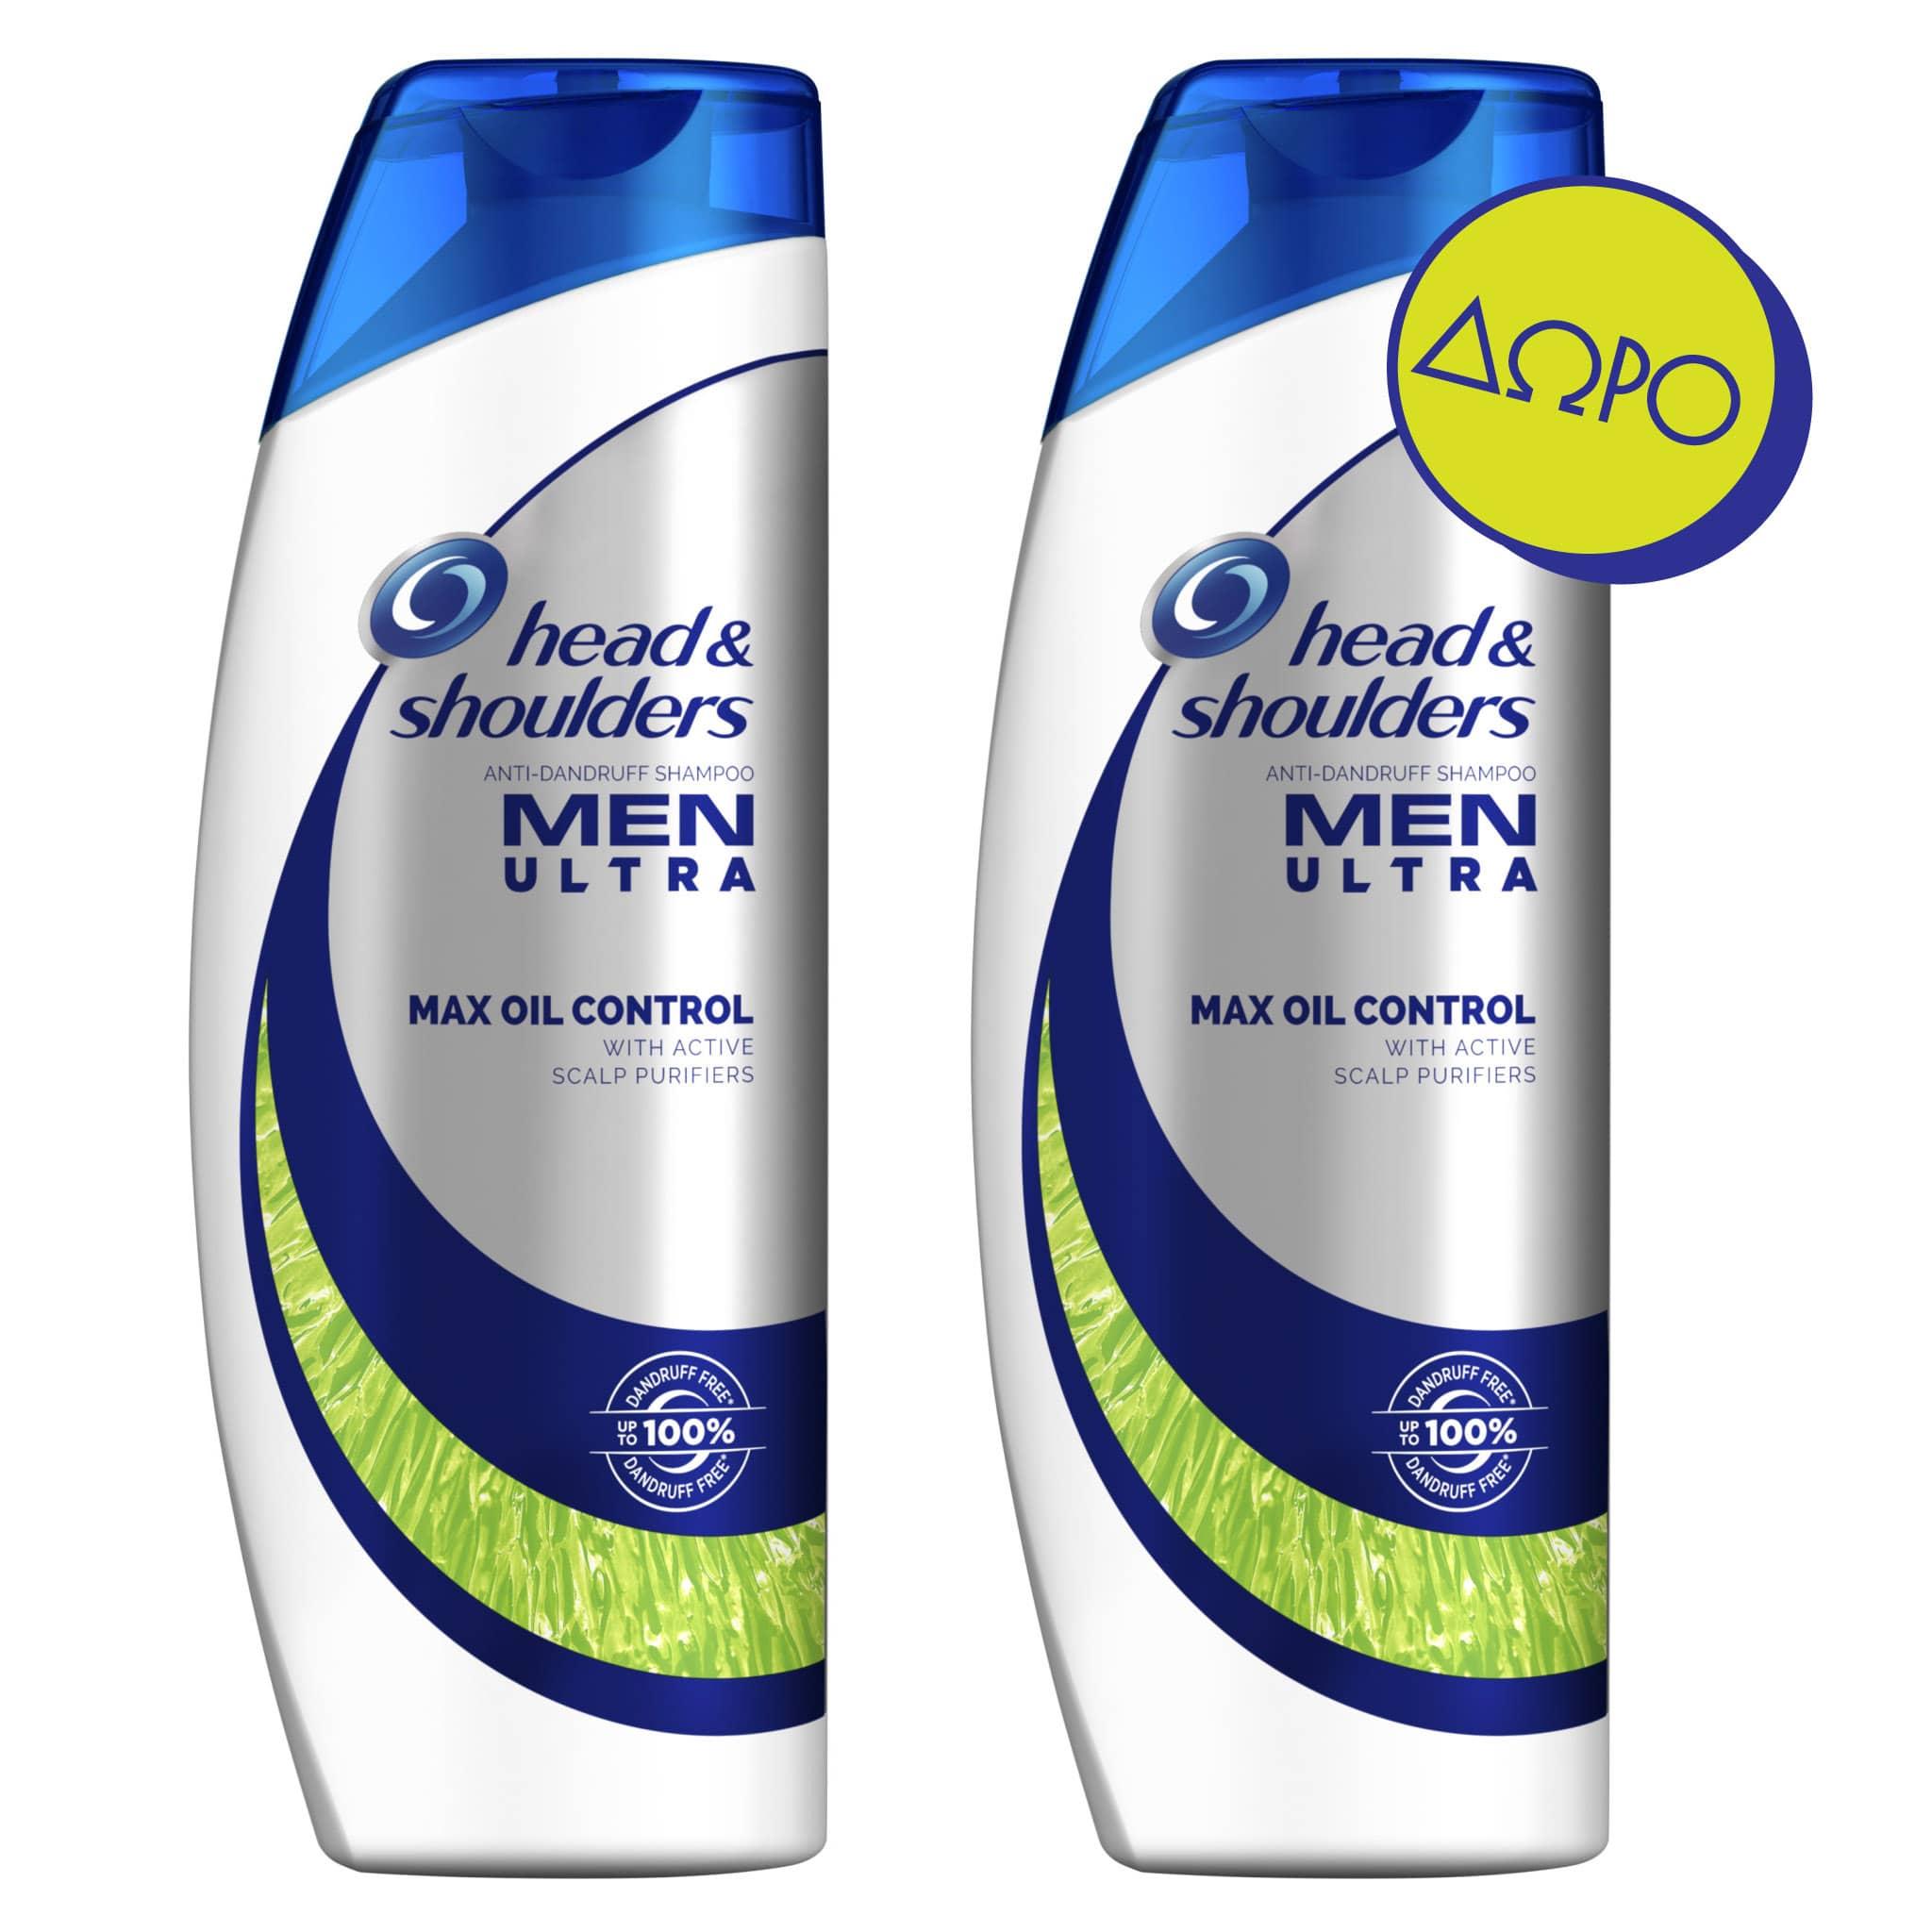 Head & Shoulders Men Ultra Max Oil Control (1+1 ΔΩΡΟ) Αντιπιτυριδικό Σαμπουάν για Άνδρες, για λιπαρά μαλλιά, 2 x 360ml